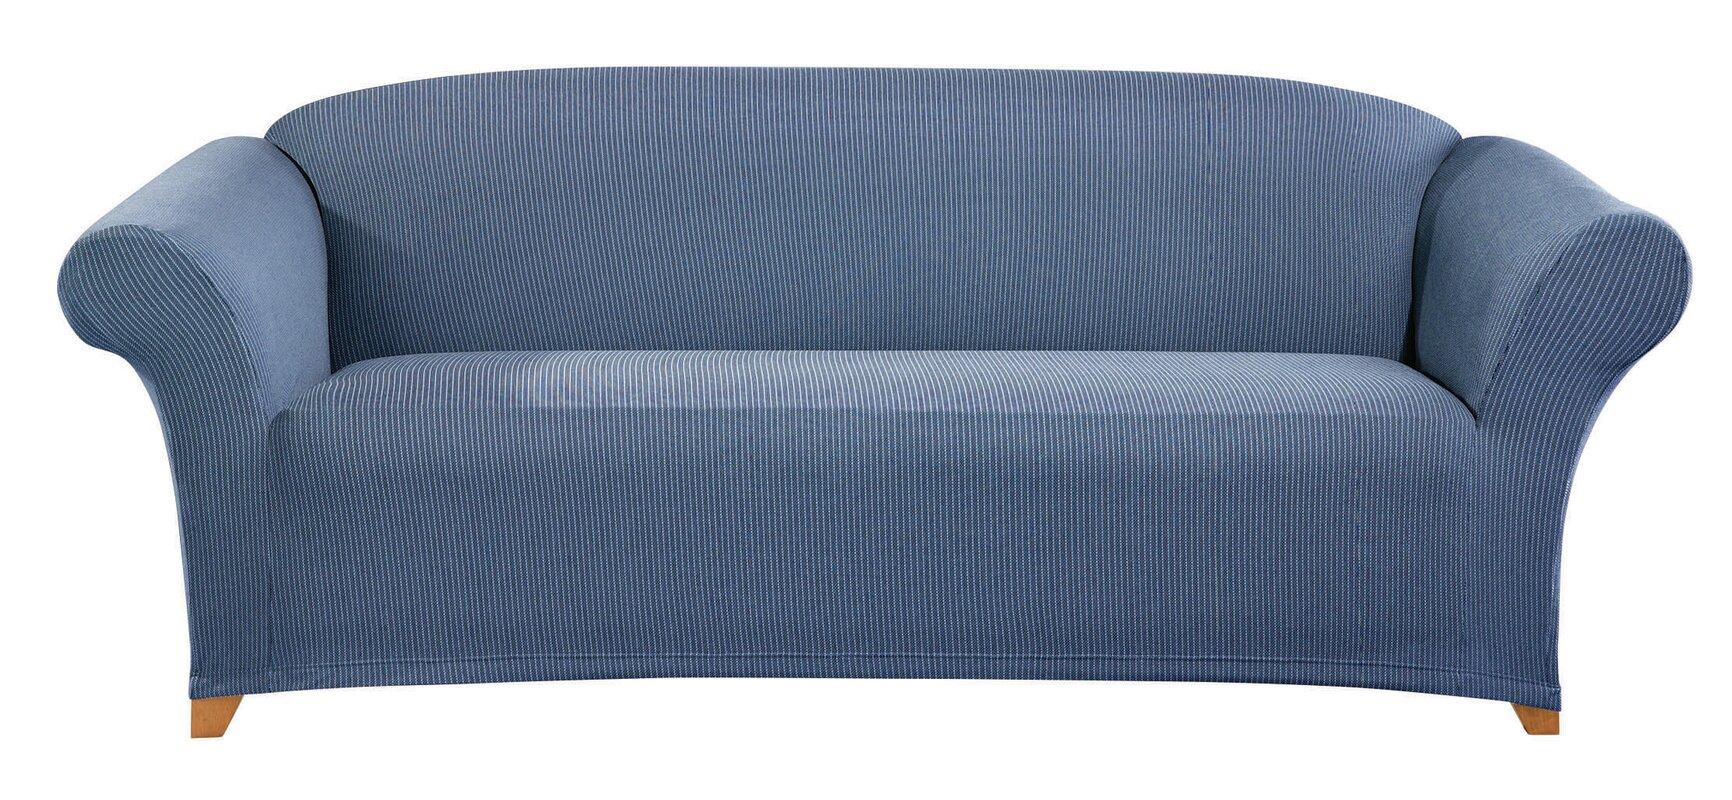 Simple Stretch Ticking Stripe Box Cushion Sofa Slipcover